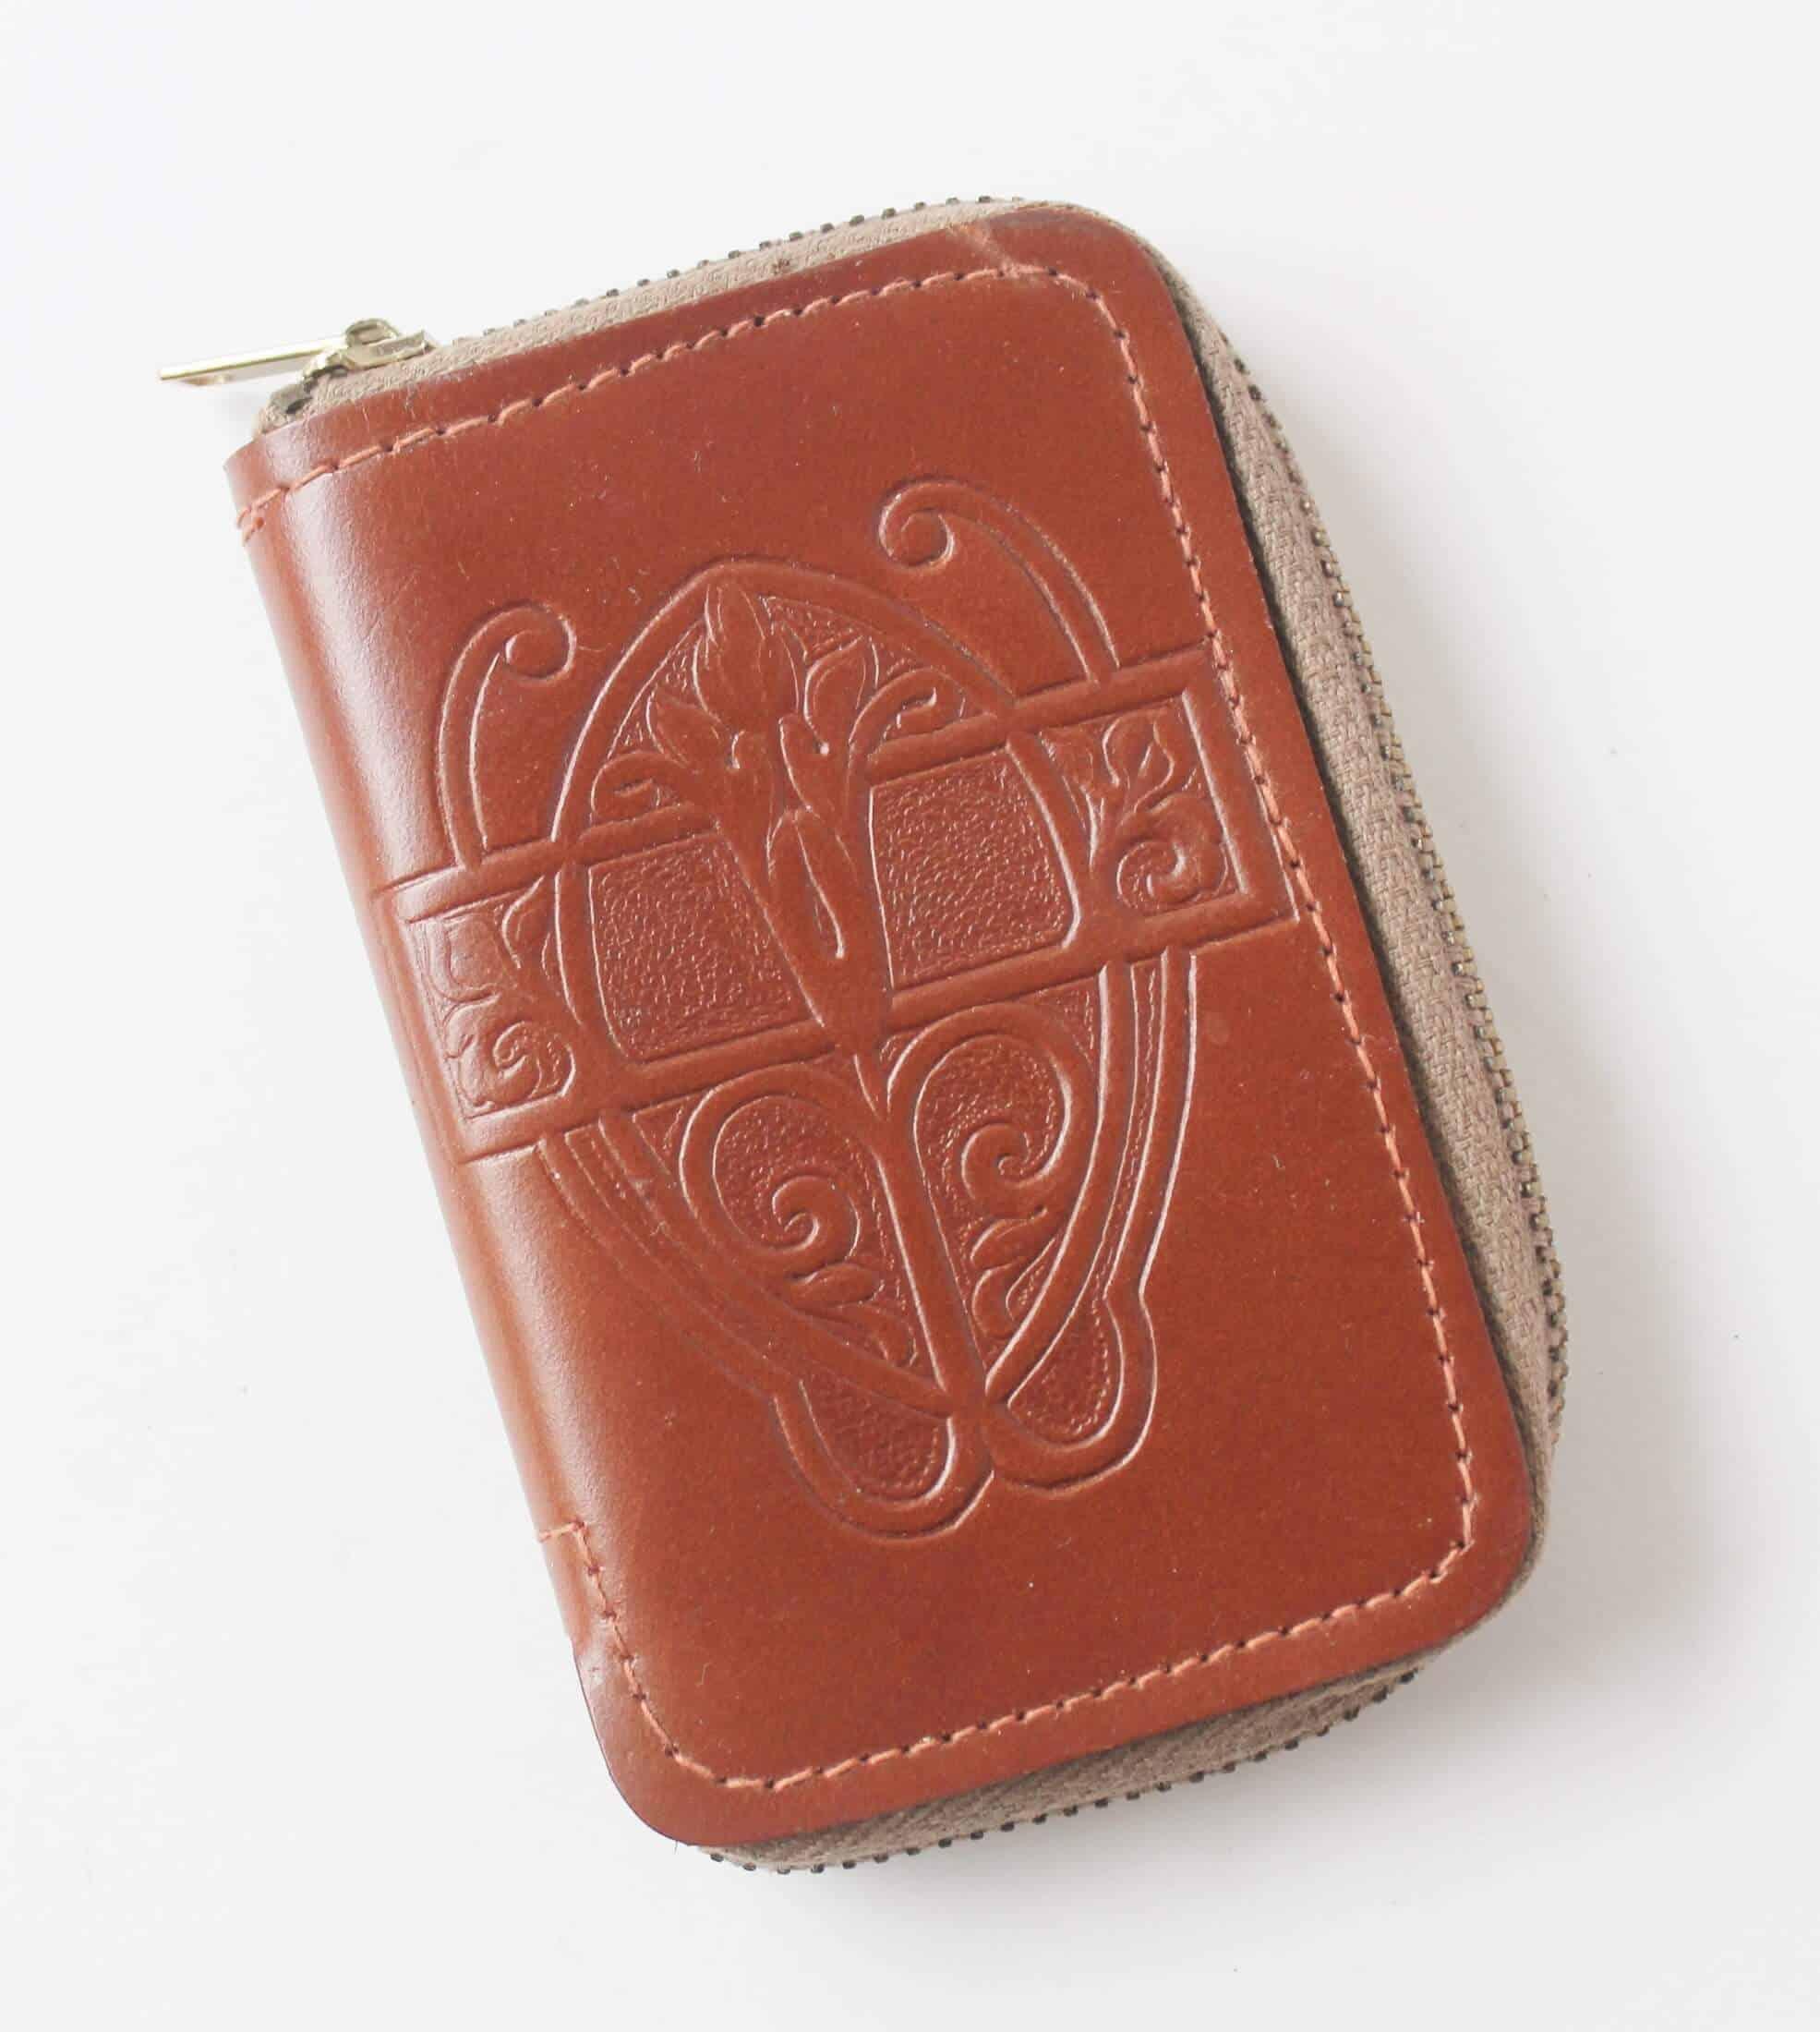 Vintage tooled leather key case